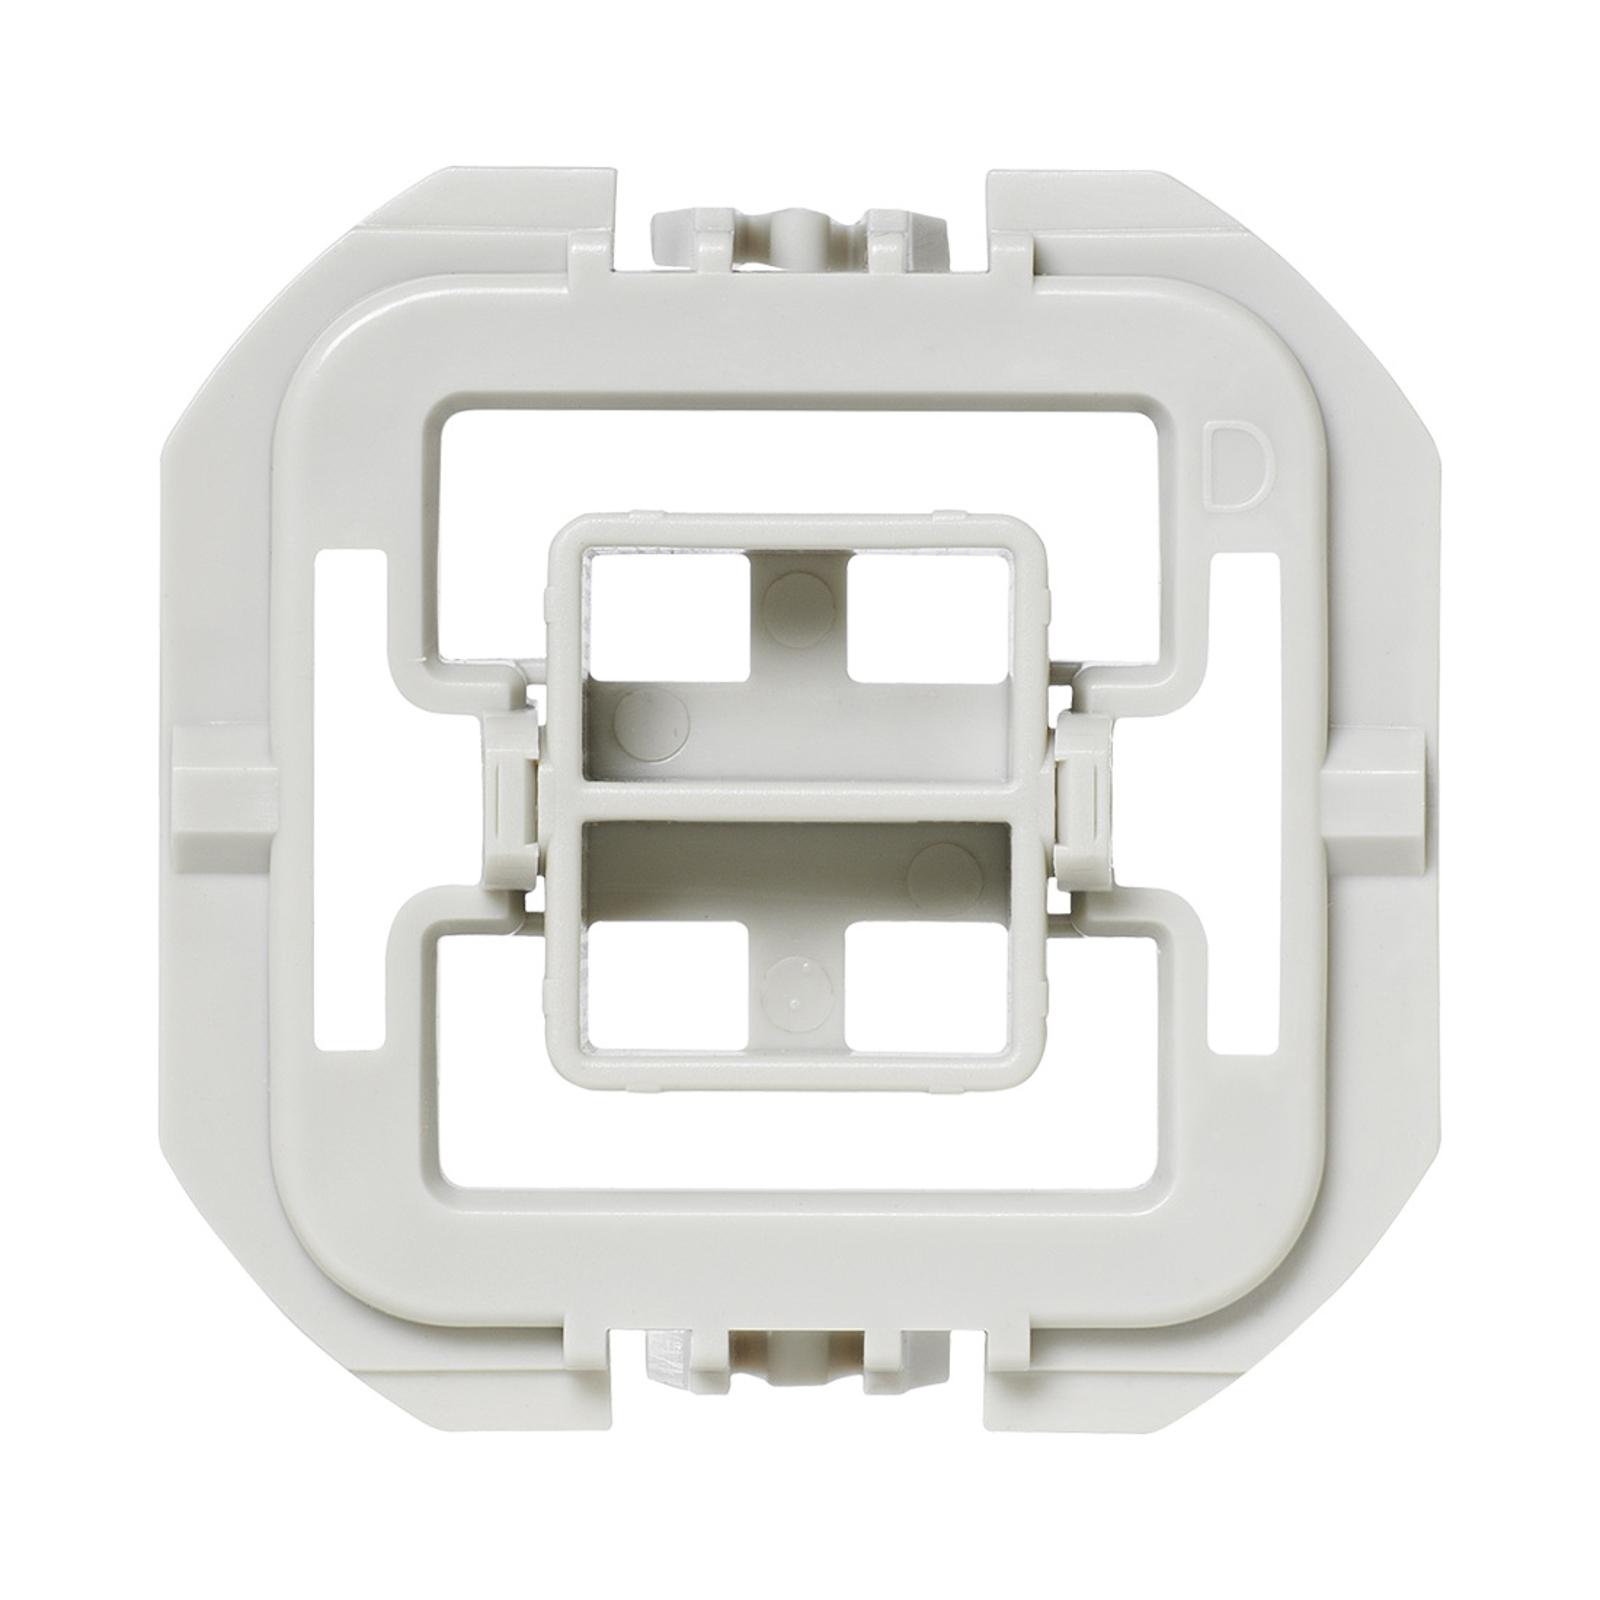 Homematic IP-adapter for Düwi/REV Ritter 1x